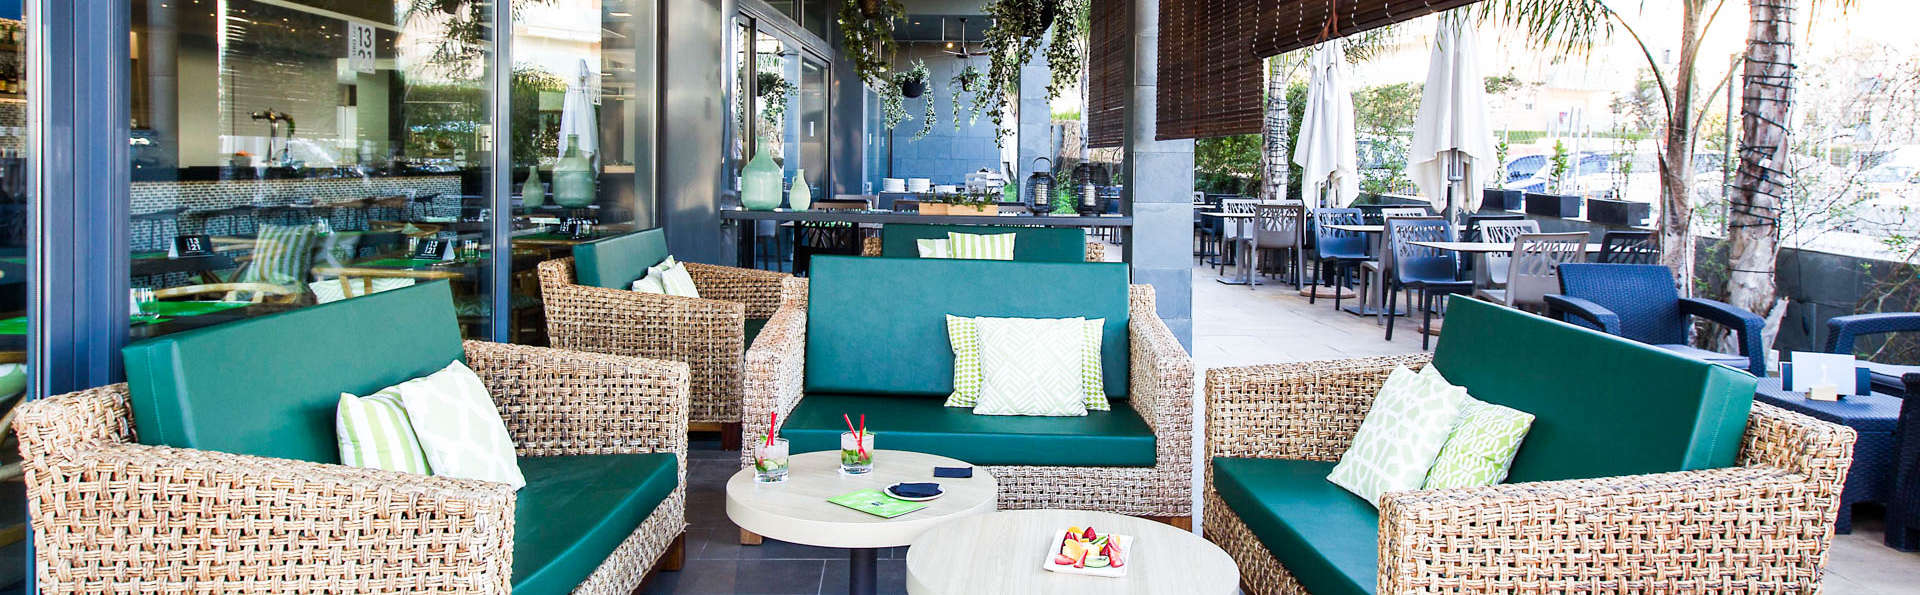 Altafulla Mar Hotel - EDIT_Terrace-3.jpg